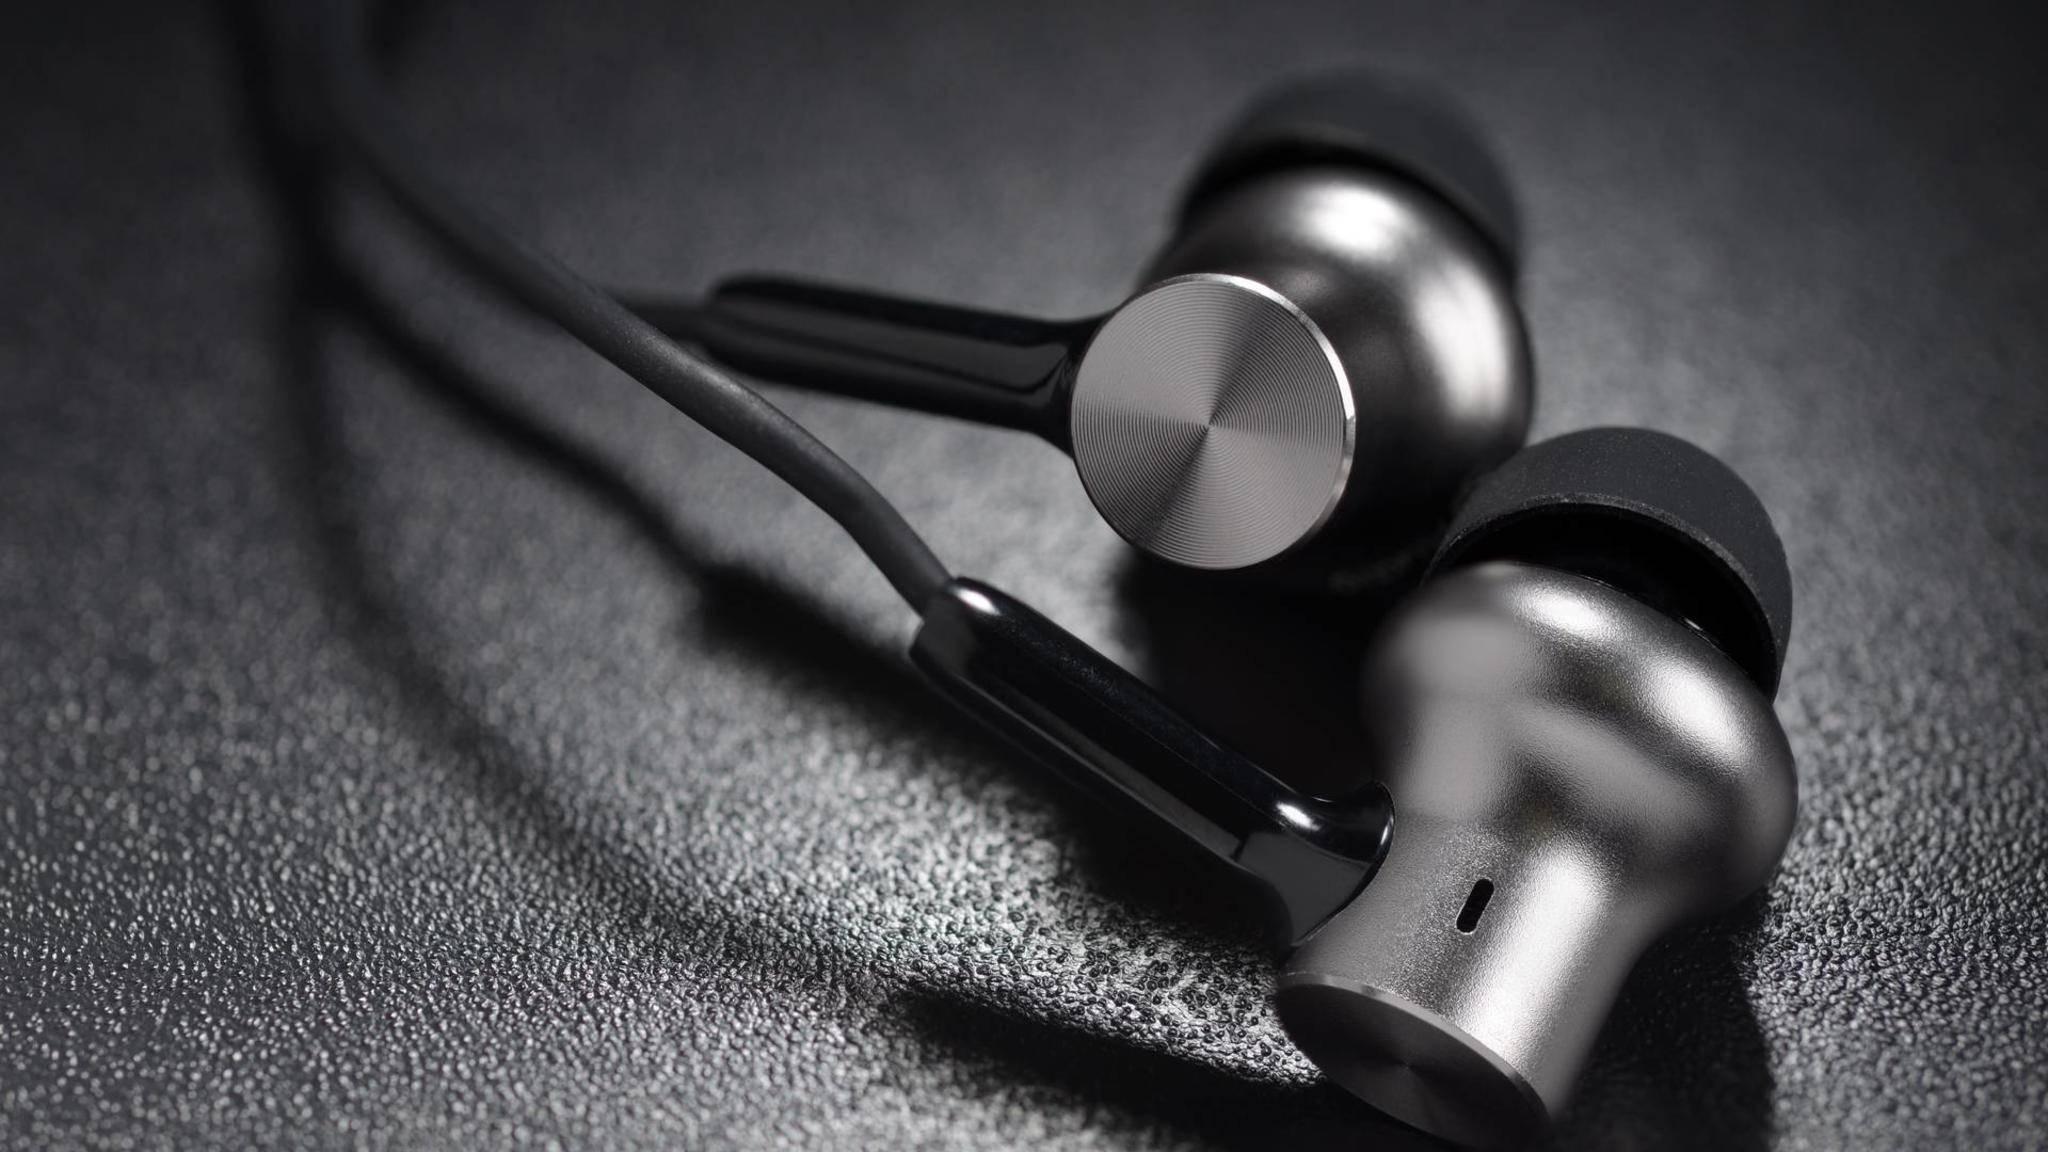 Metallic ear buds